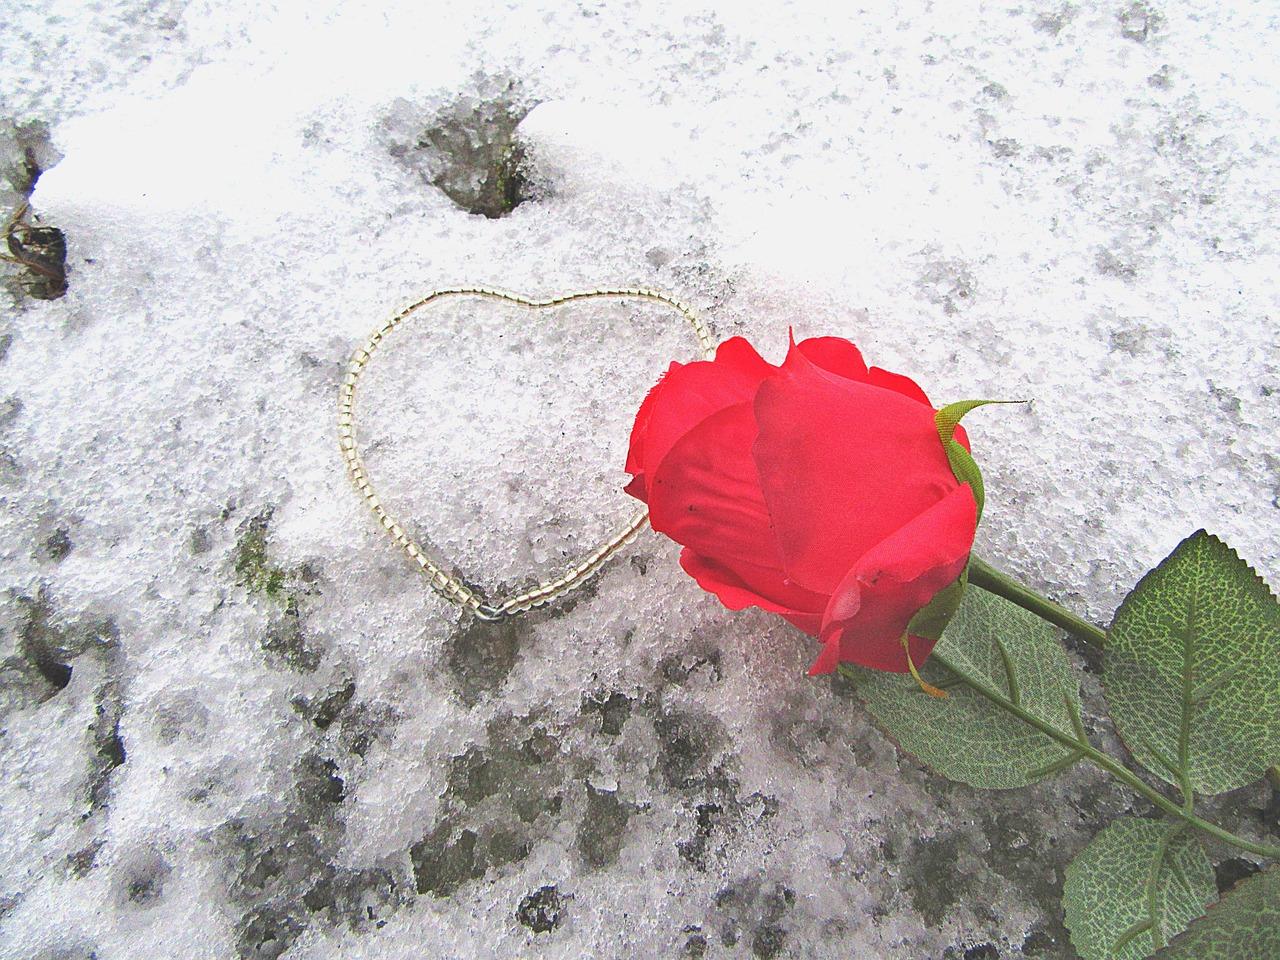 Кунгурского, картинки розы на снегу люблю